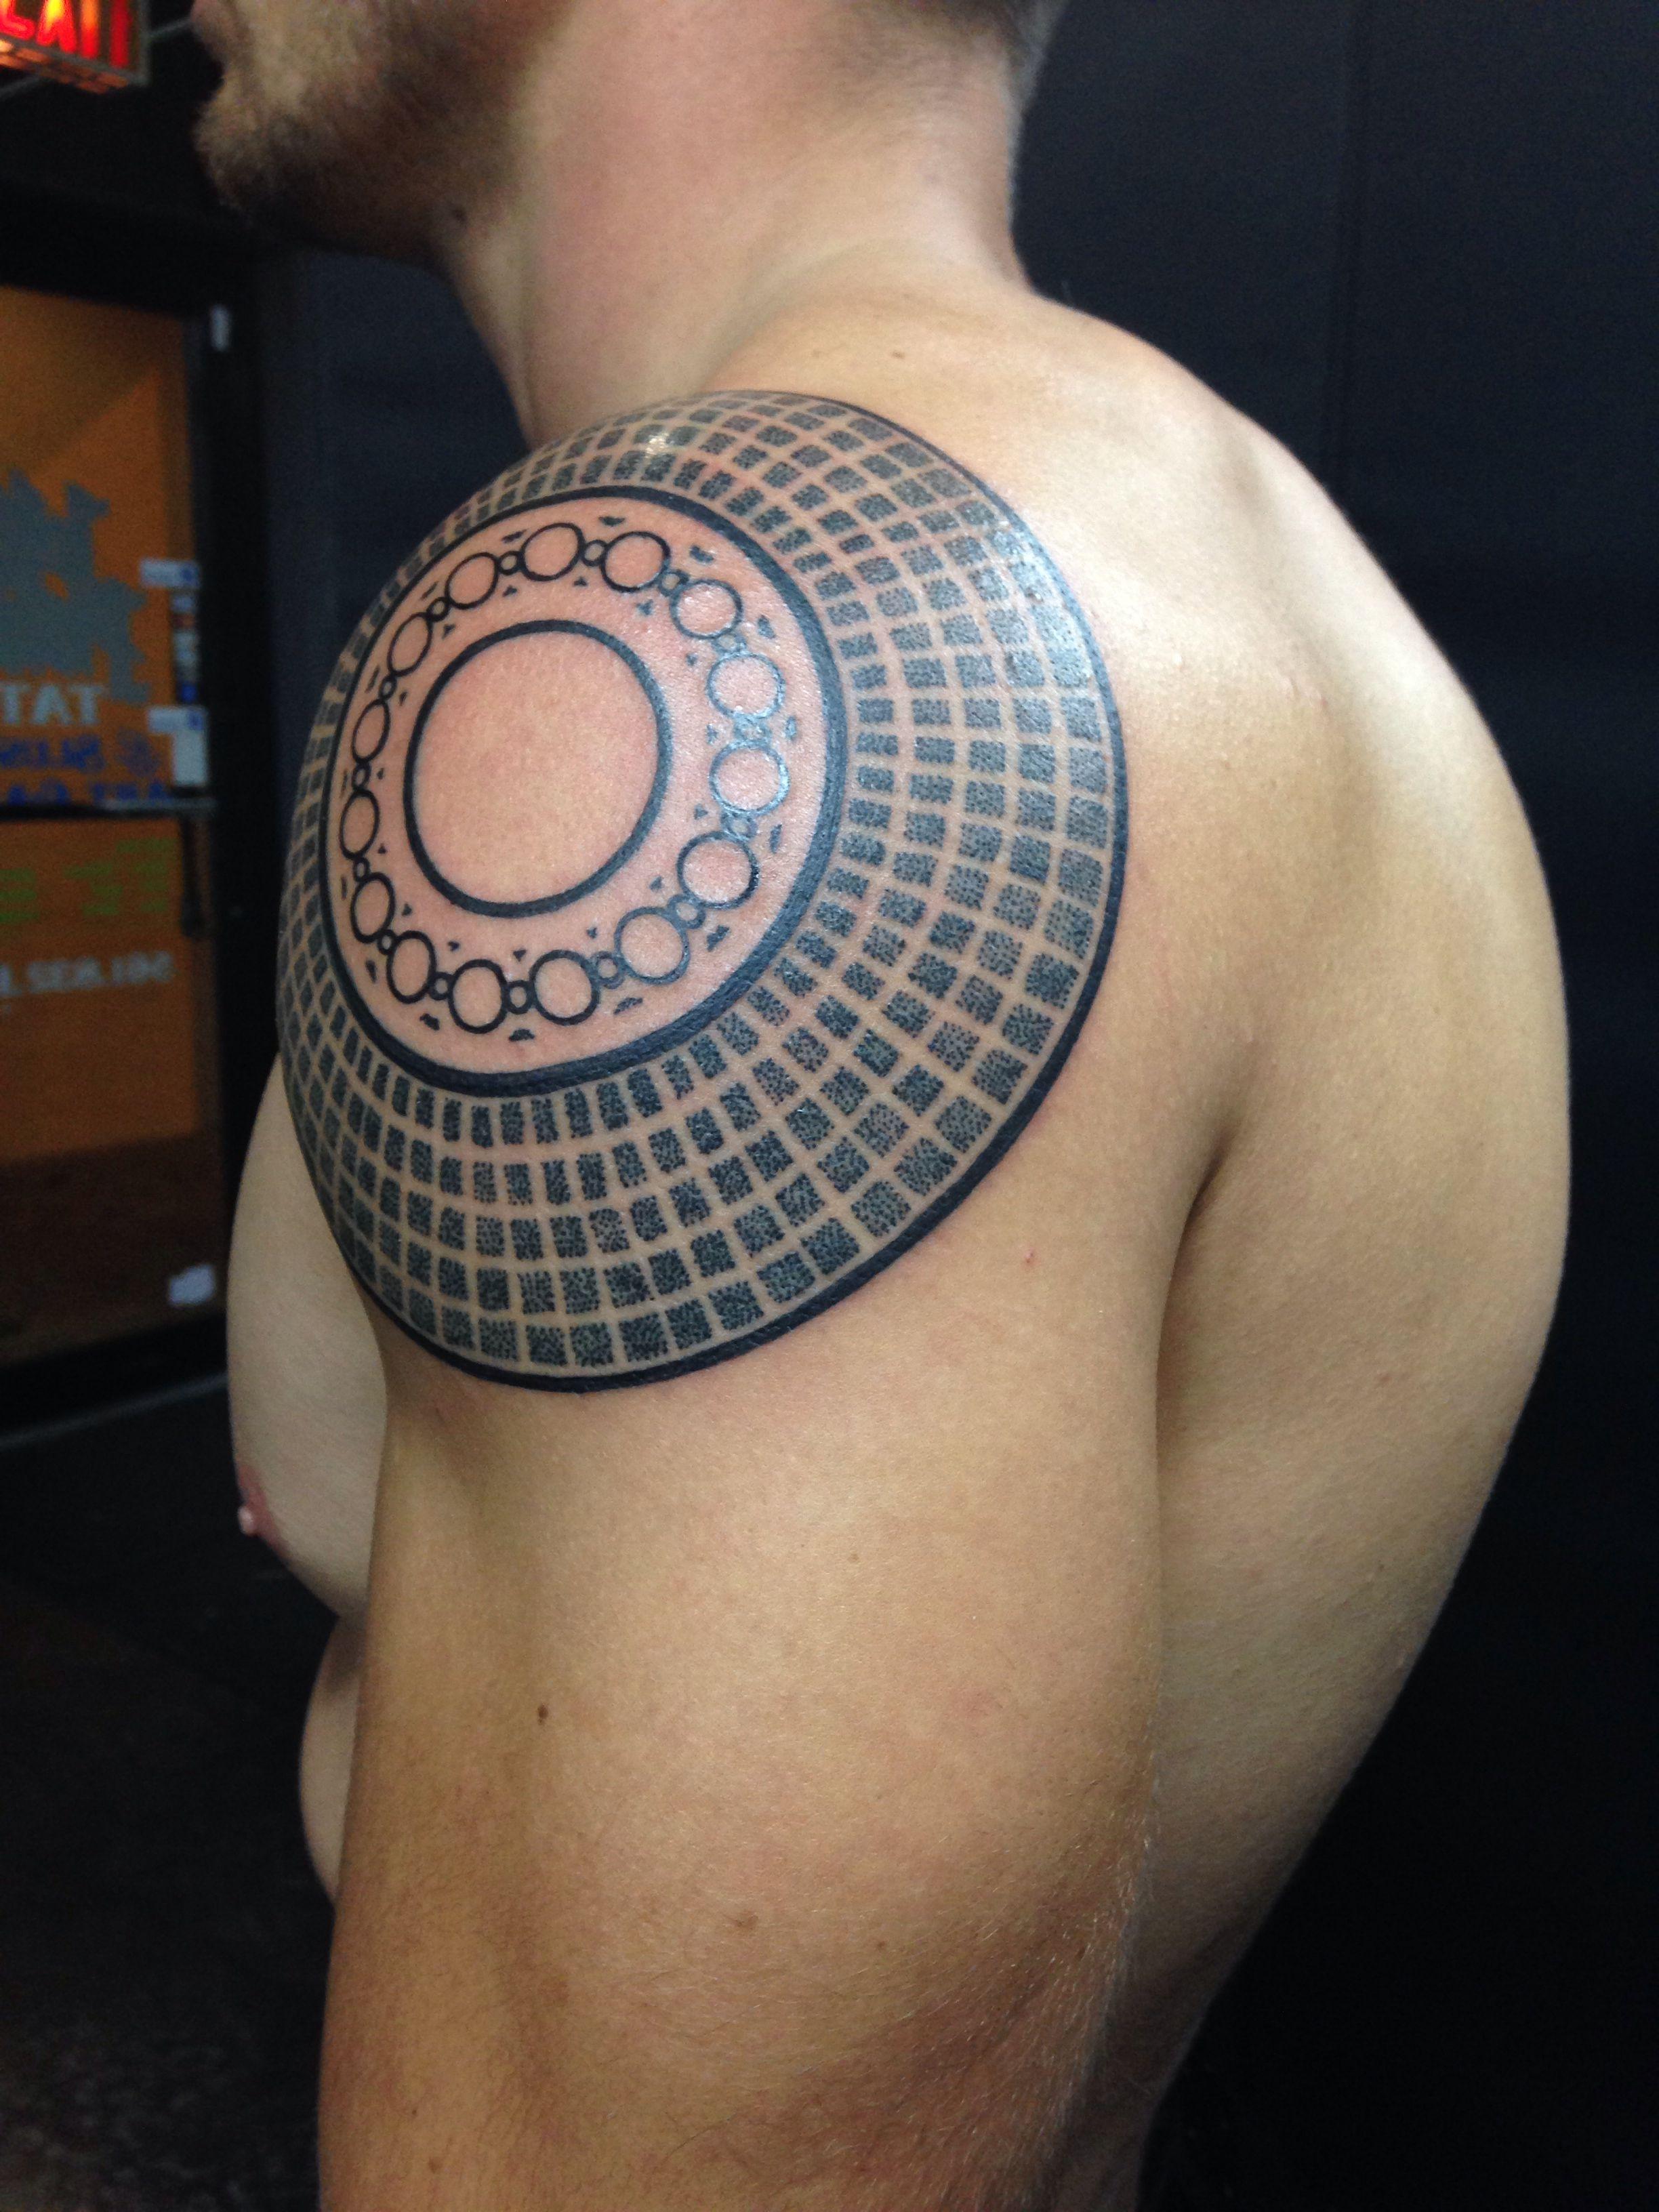 40 Inspirational Creative Tattoo Ideas For Men and Women